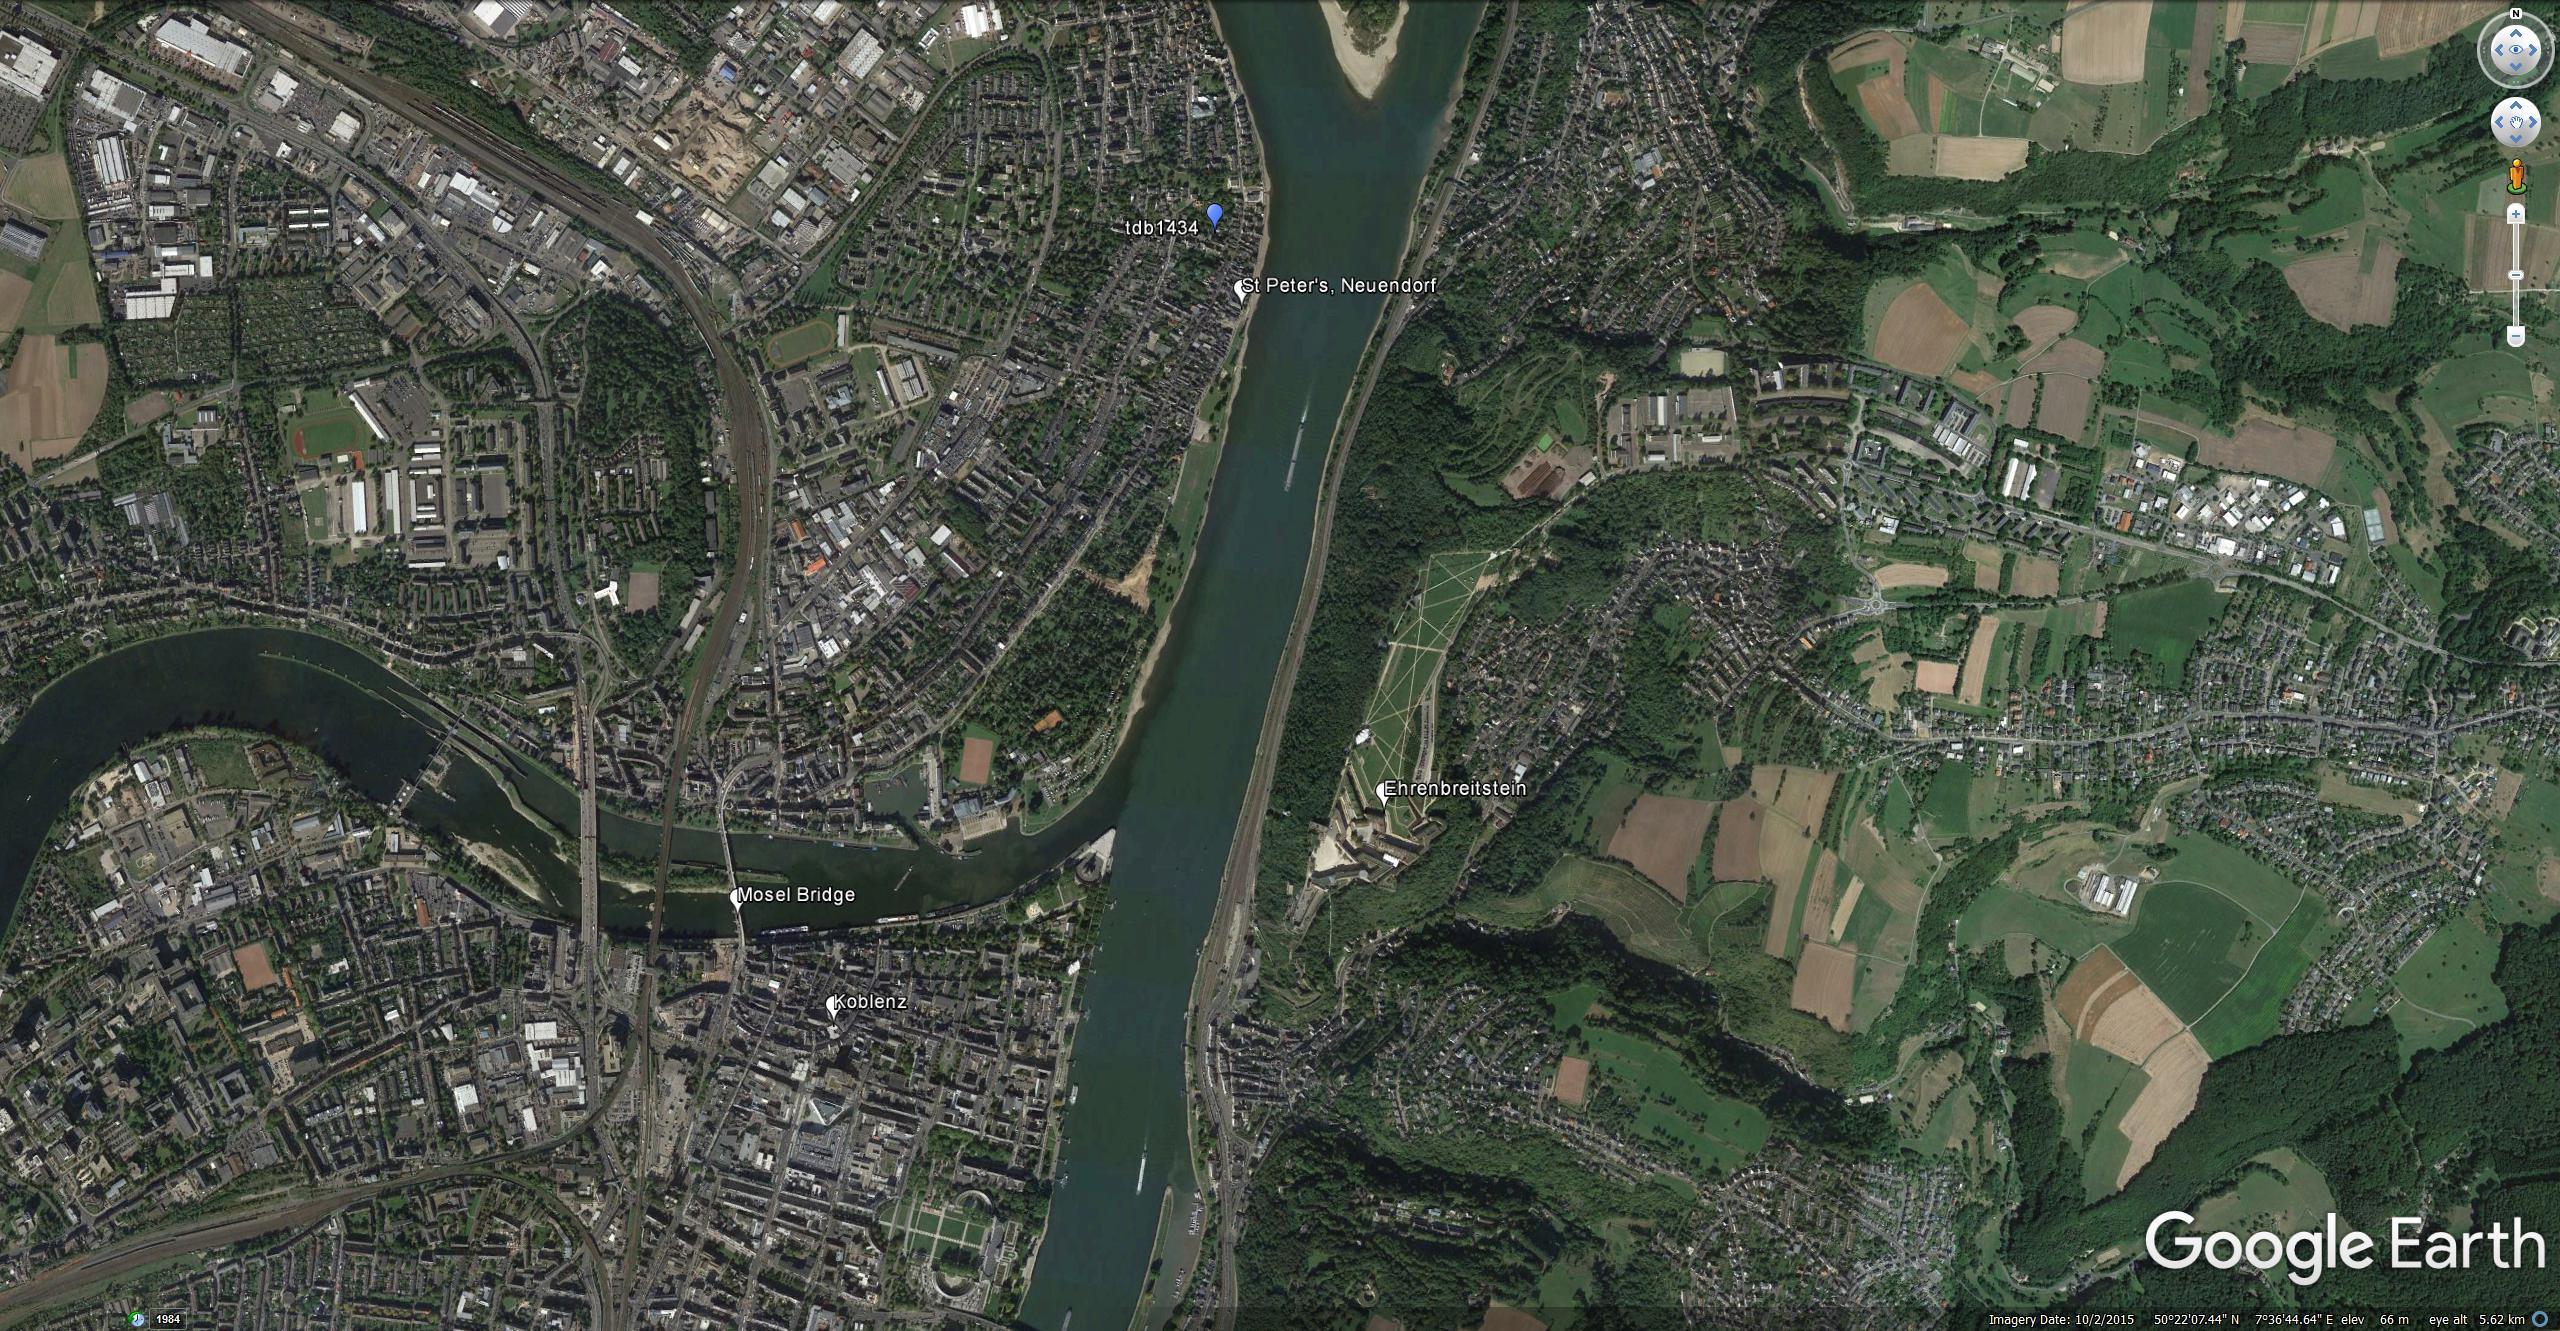 Google Earth Aerial View of Neuendorf, Ehrenbreitstein and Koblenz, showing Turner's viewpoints